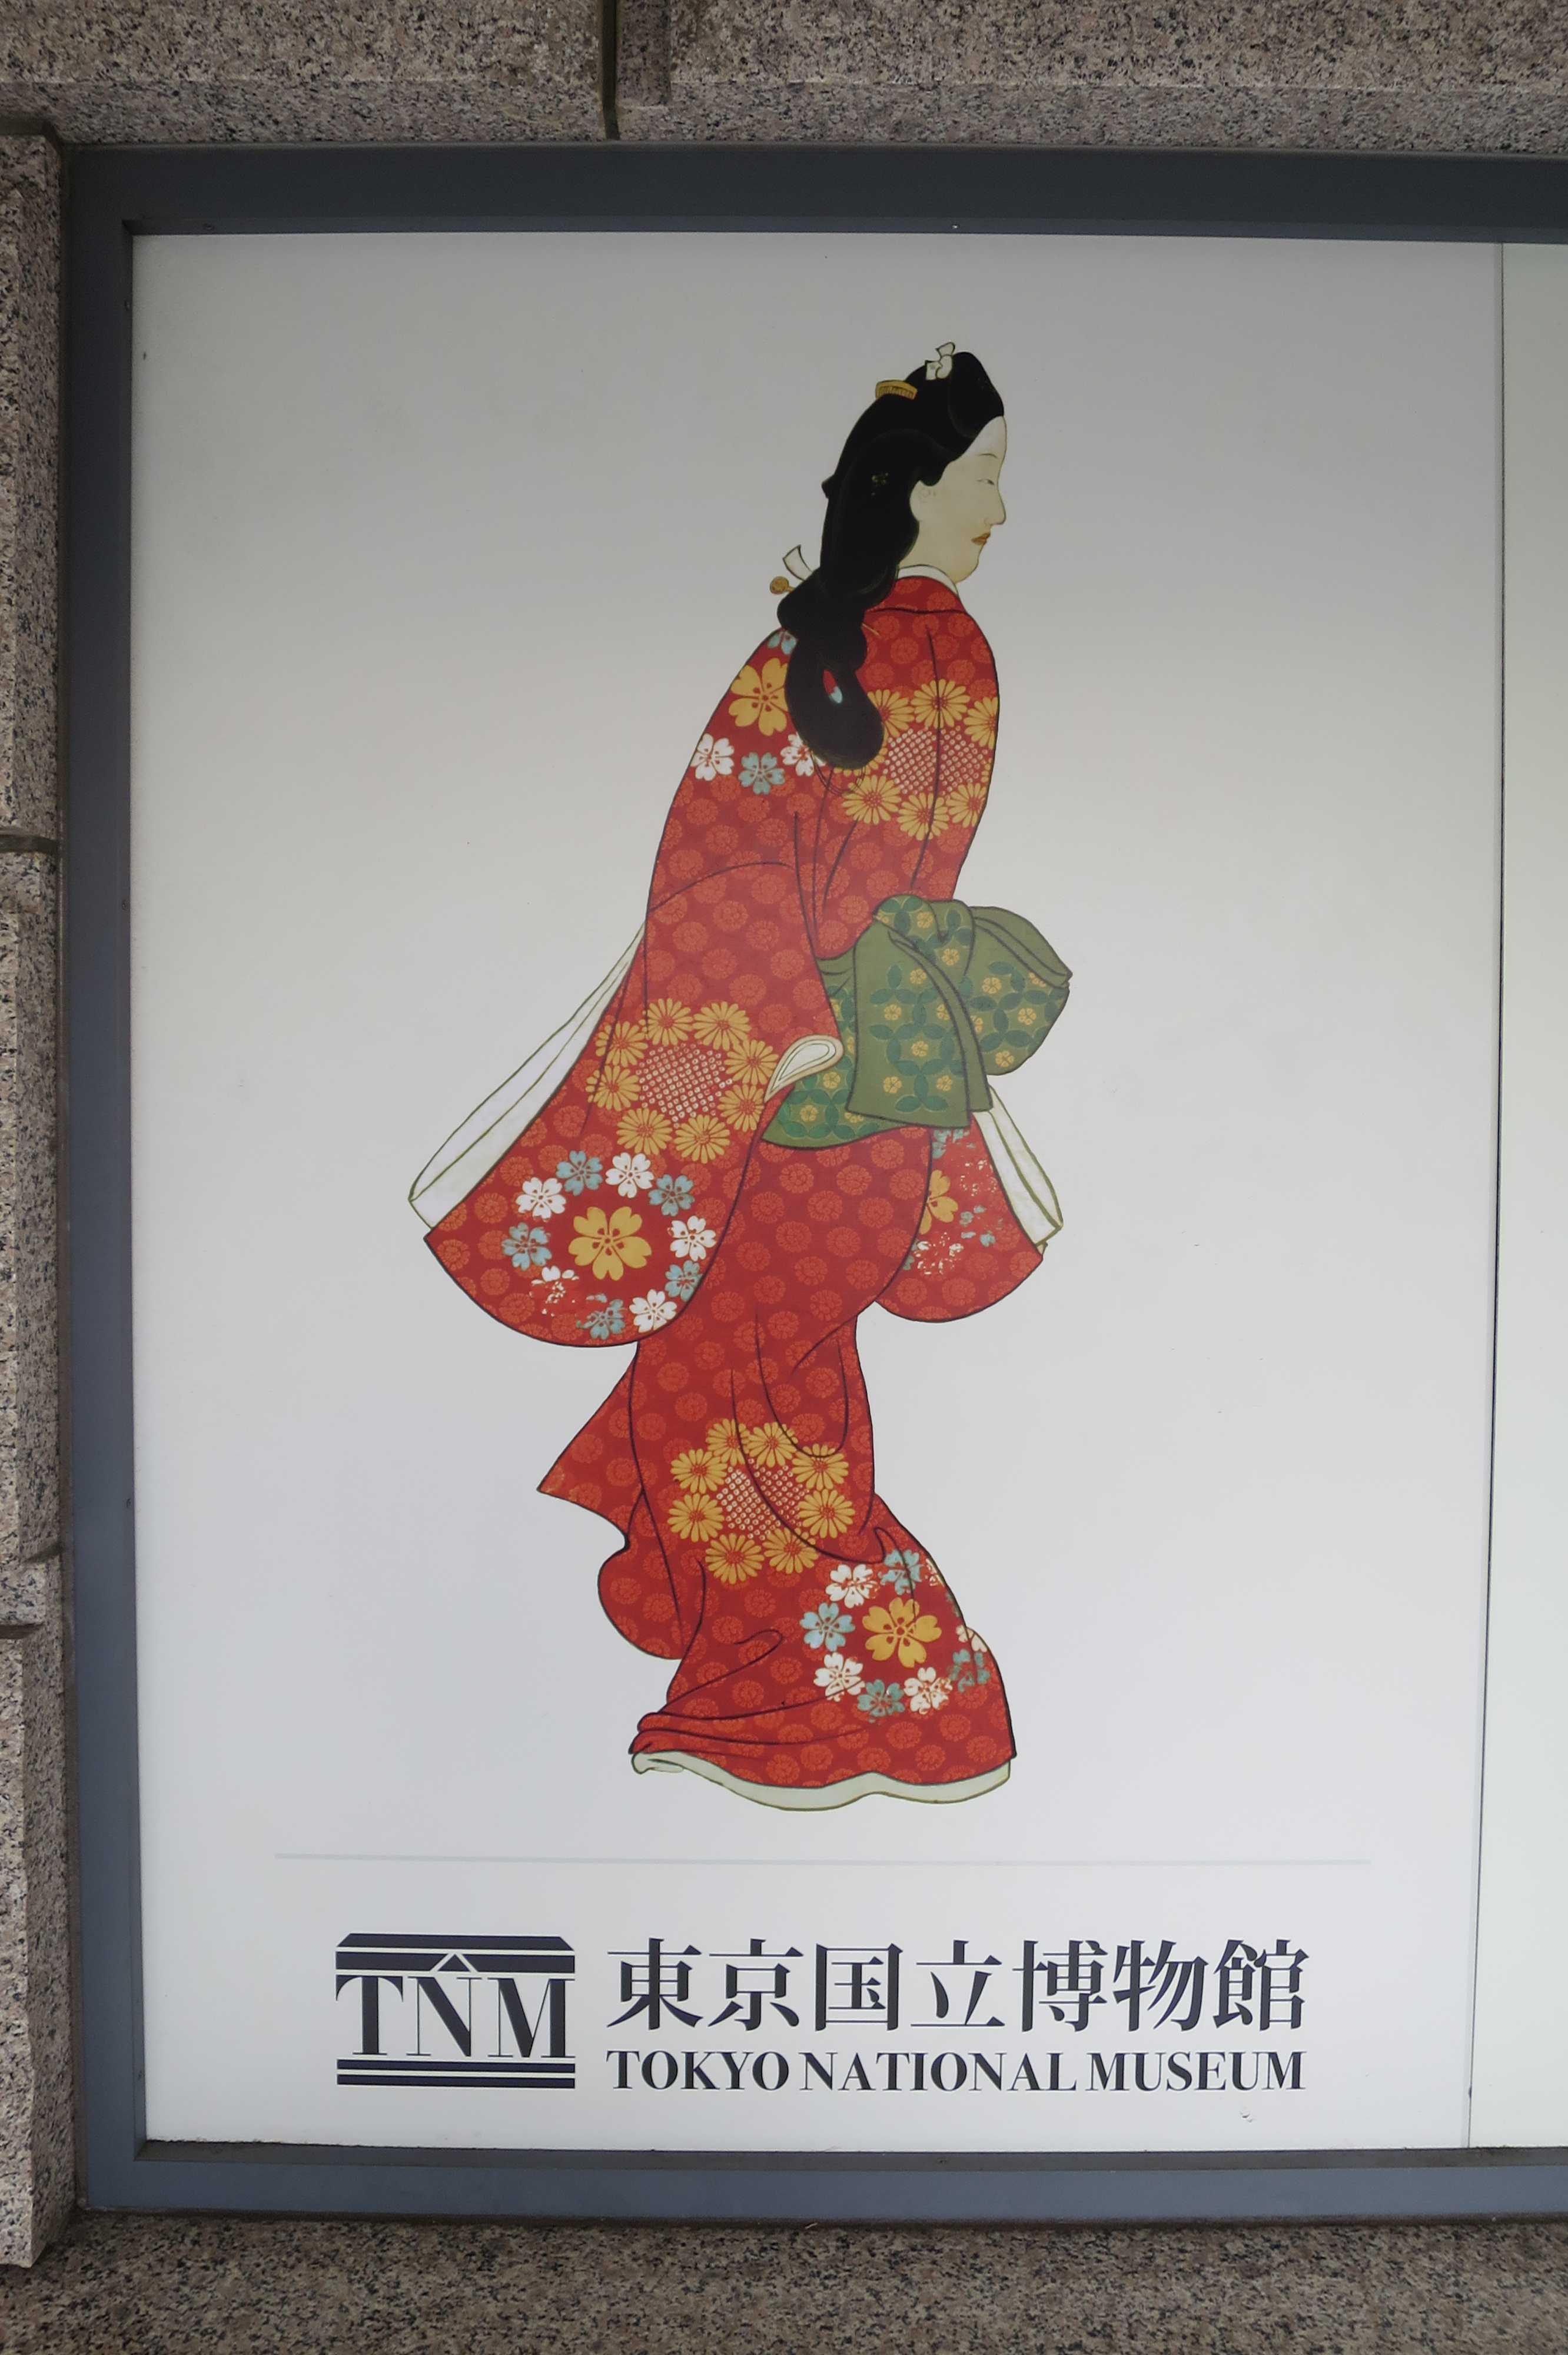 東京国立博物館(TOKYO NATIONAL MUSEUM)